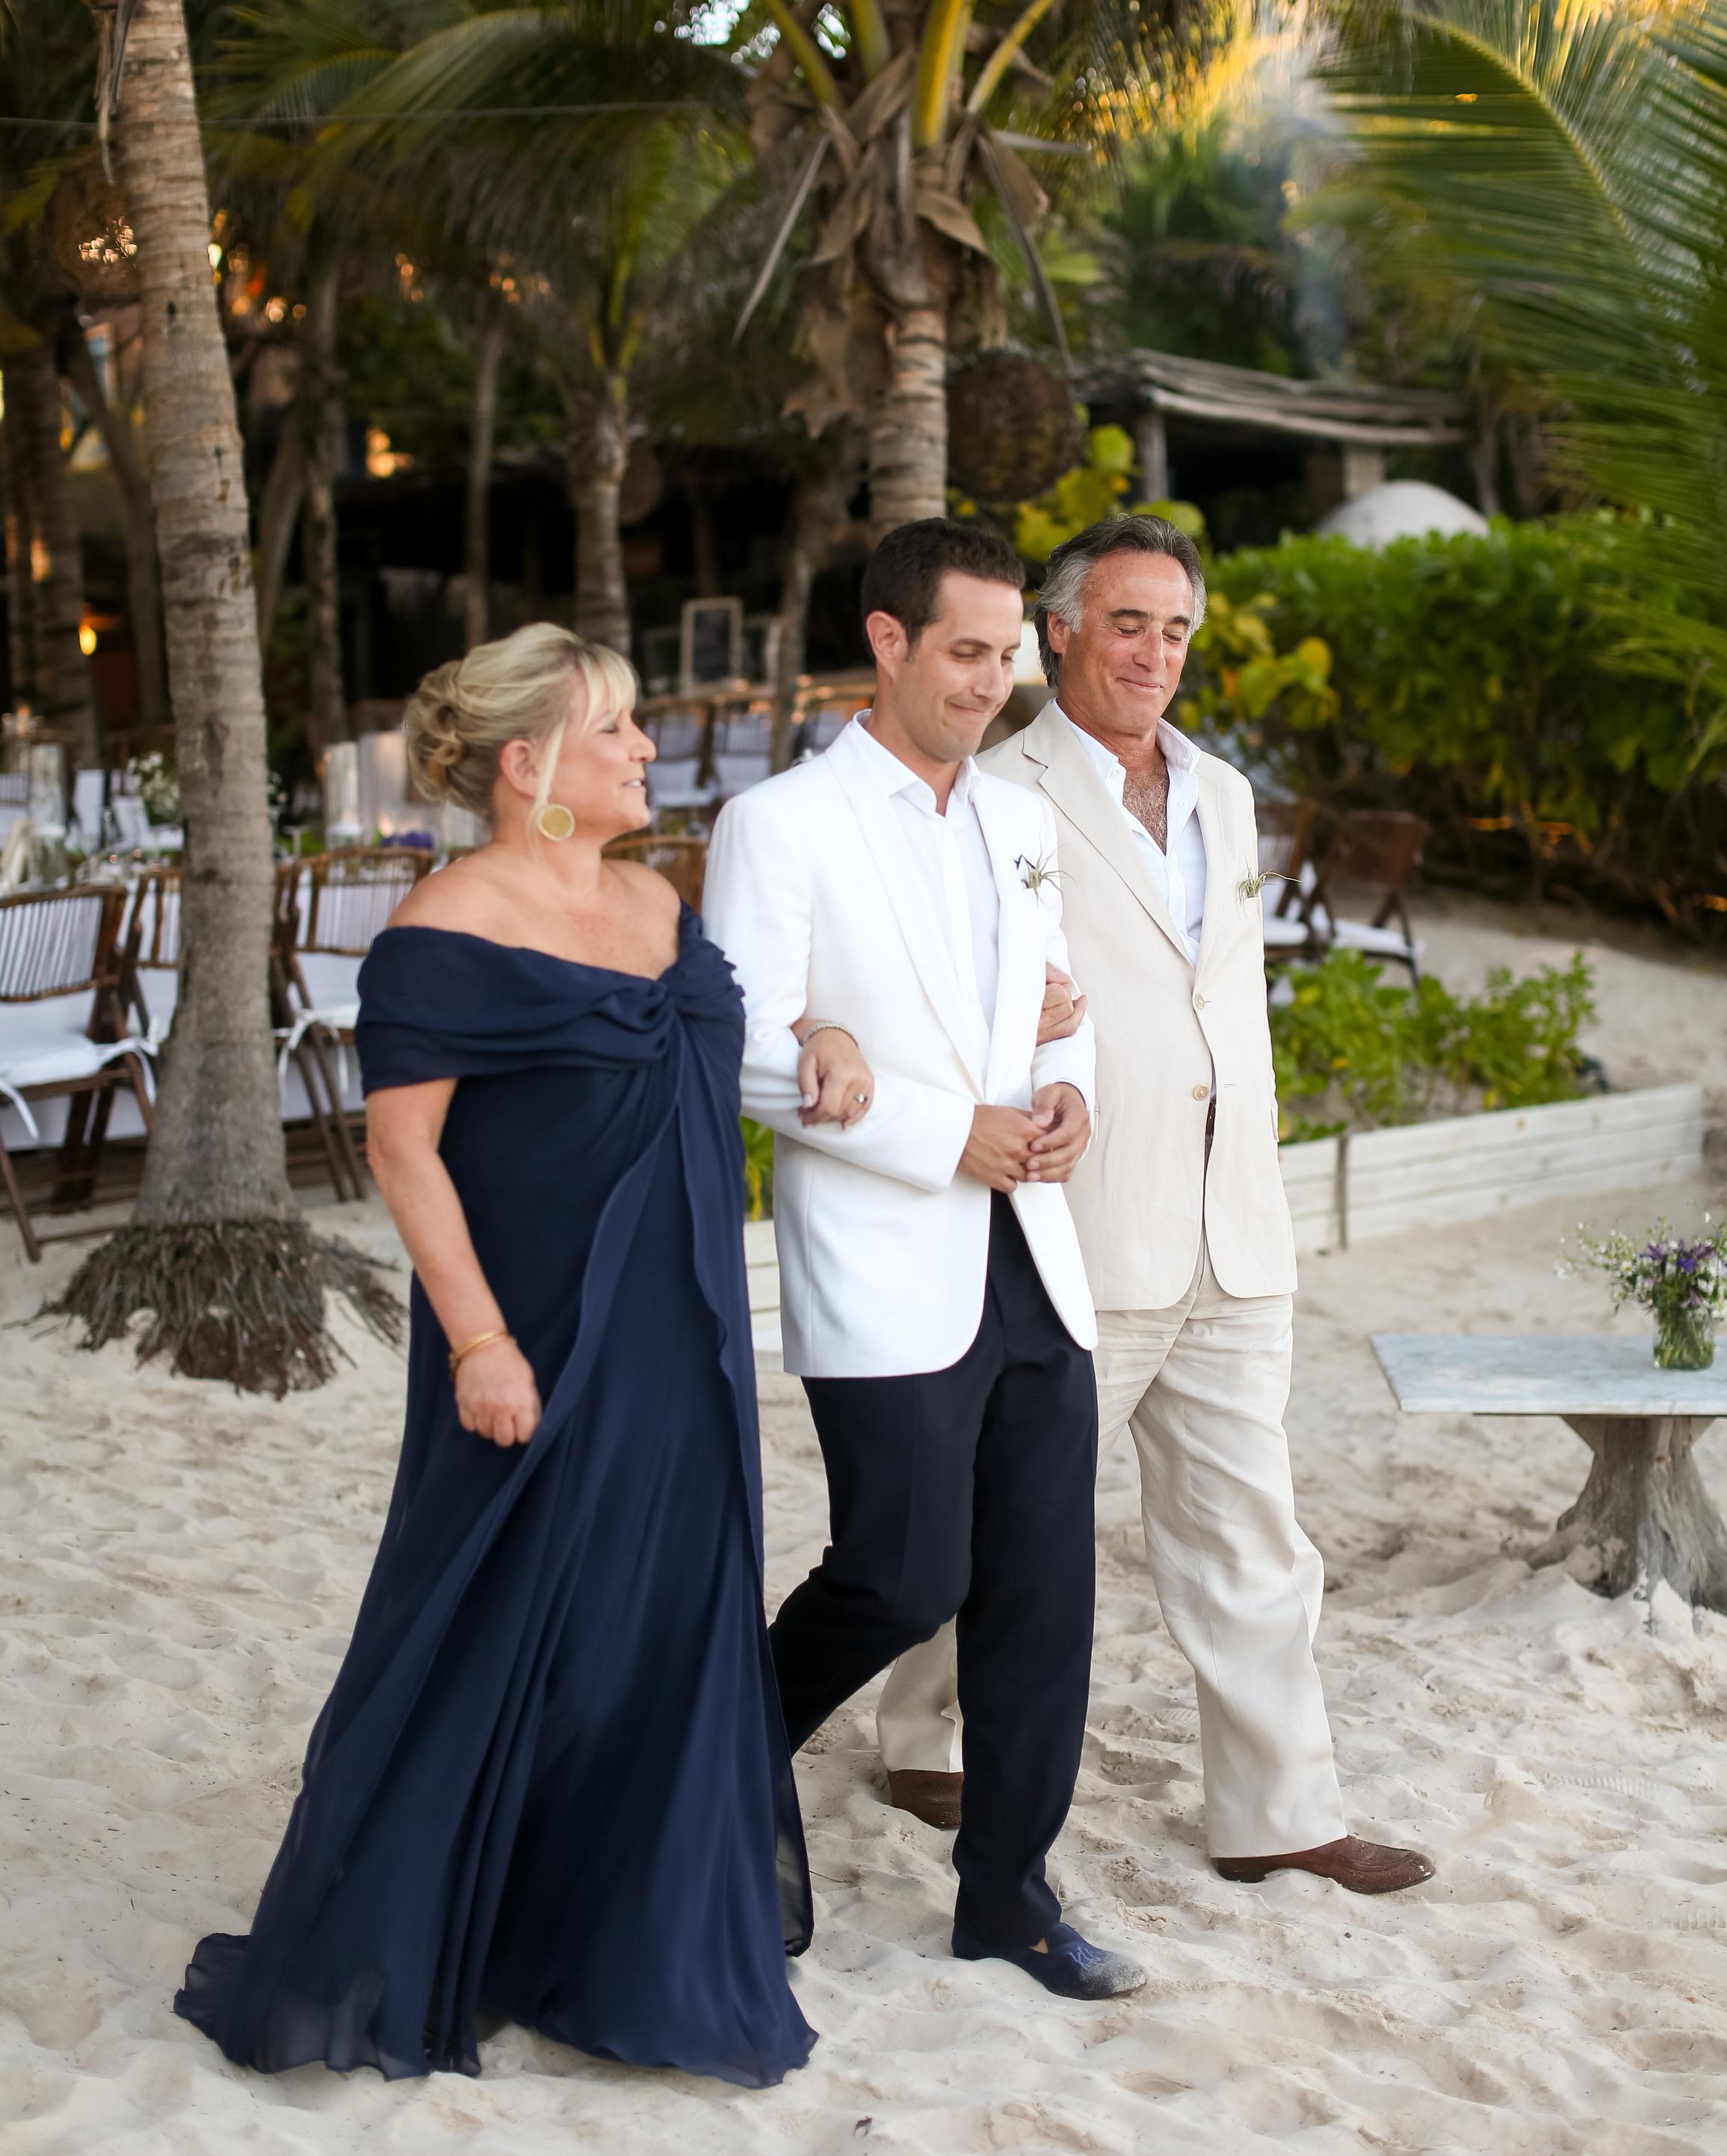 olivia-keith-wedding-ceremony-23-s112304-0815.jpg